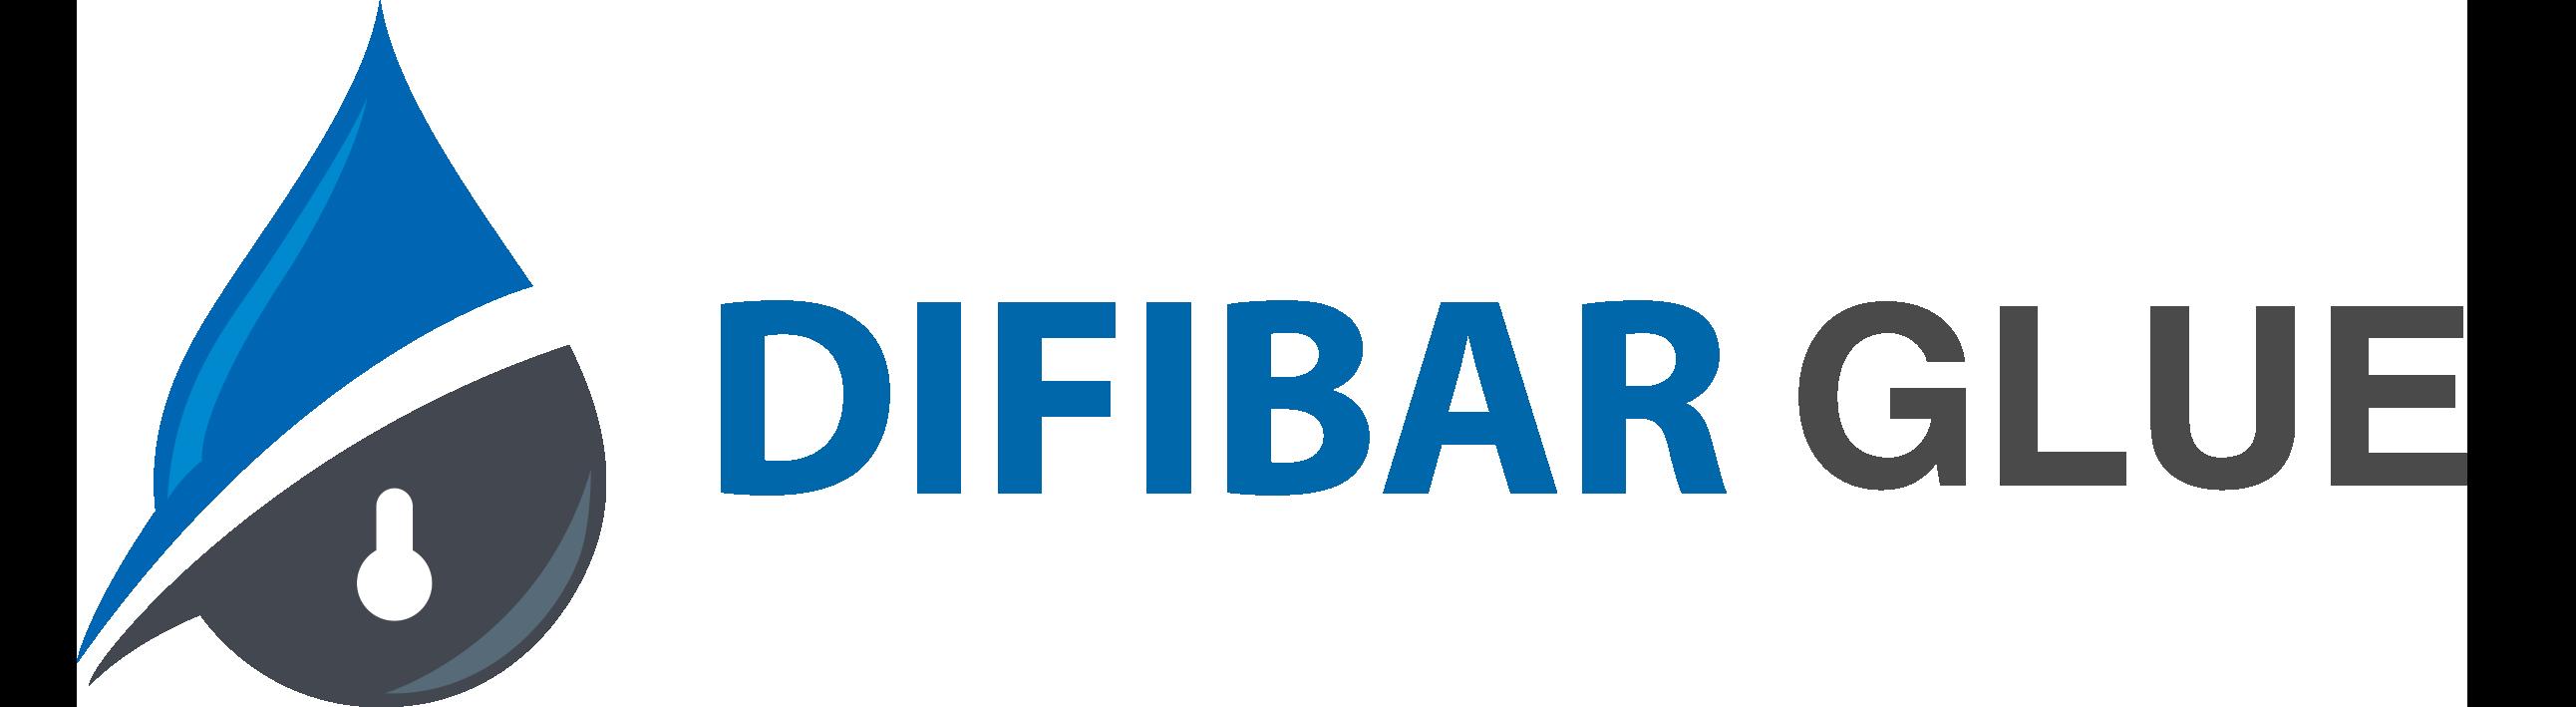 Logo-DIFIBAR GLUE